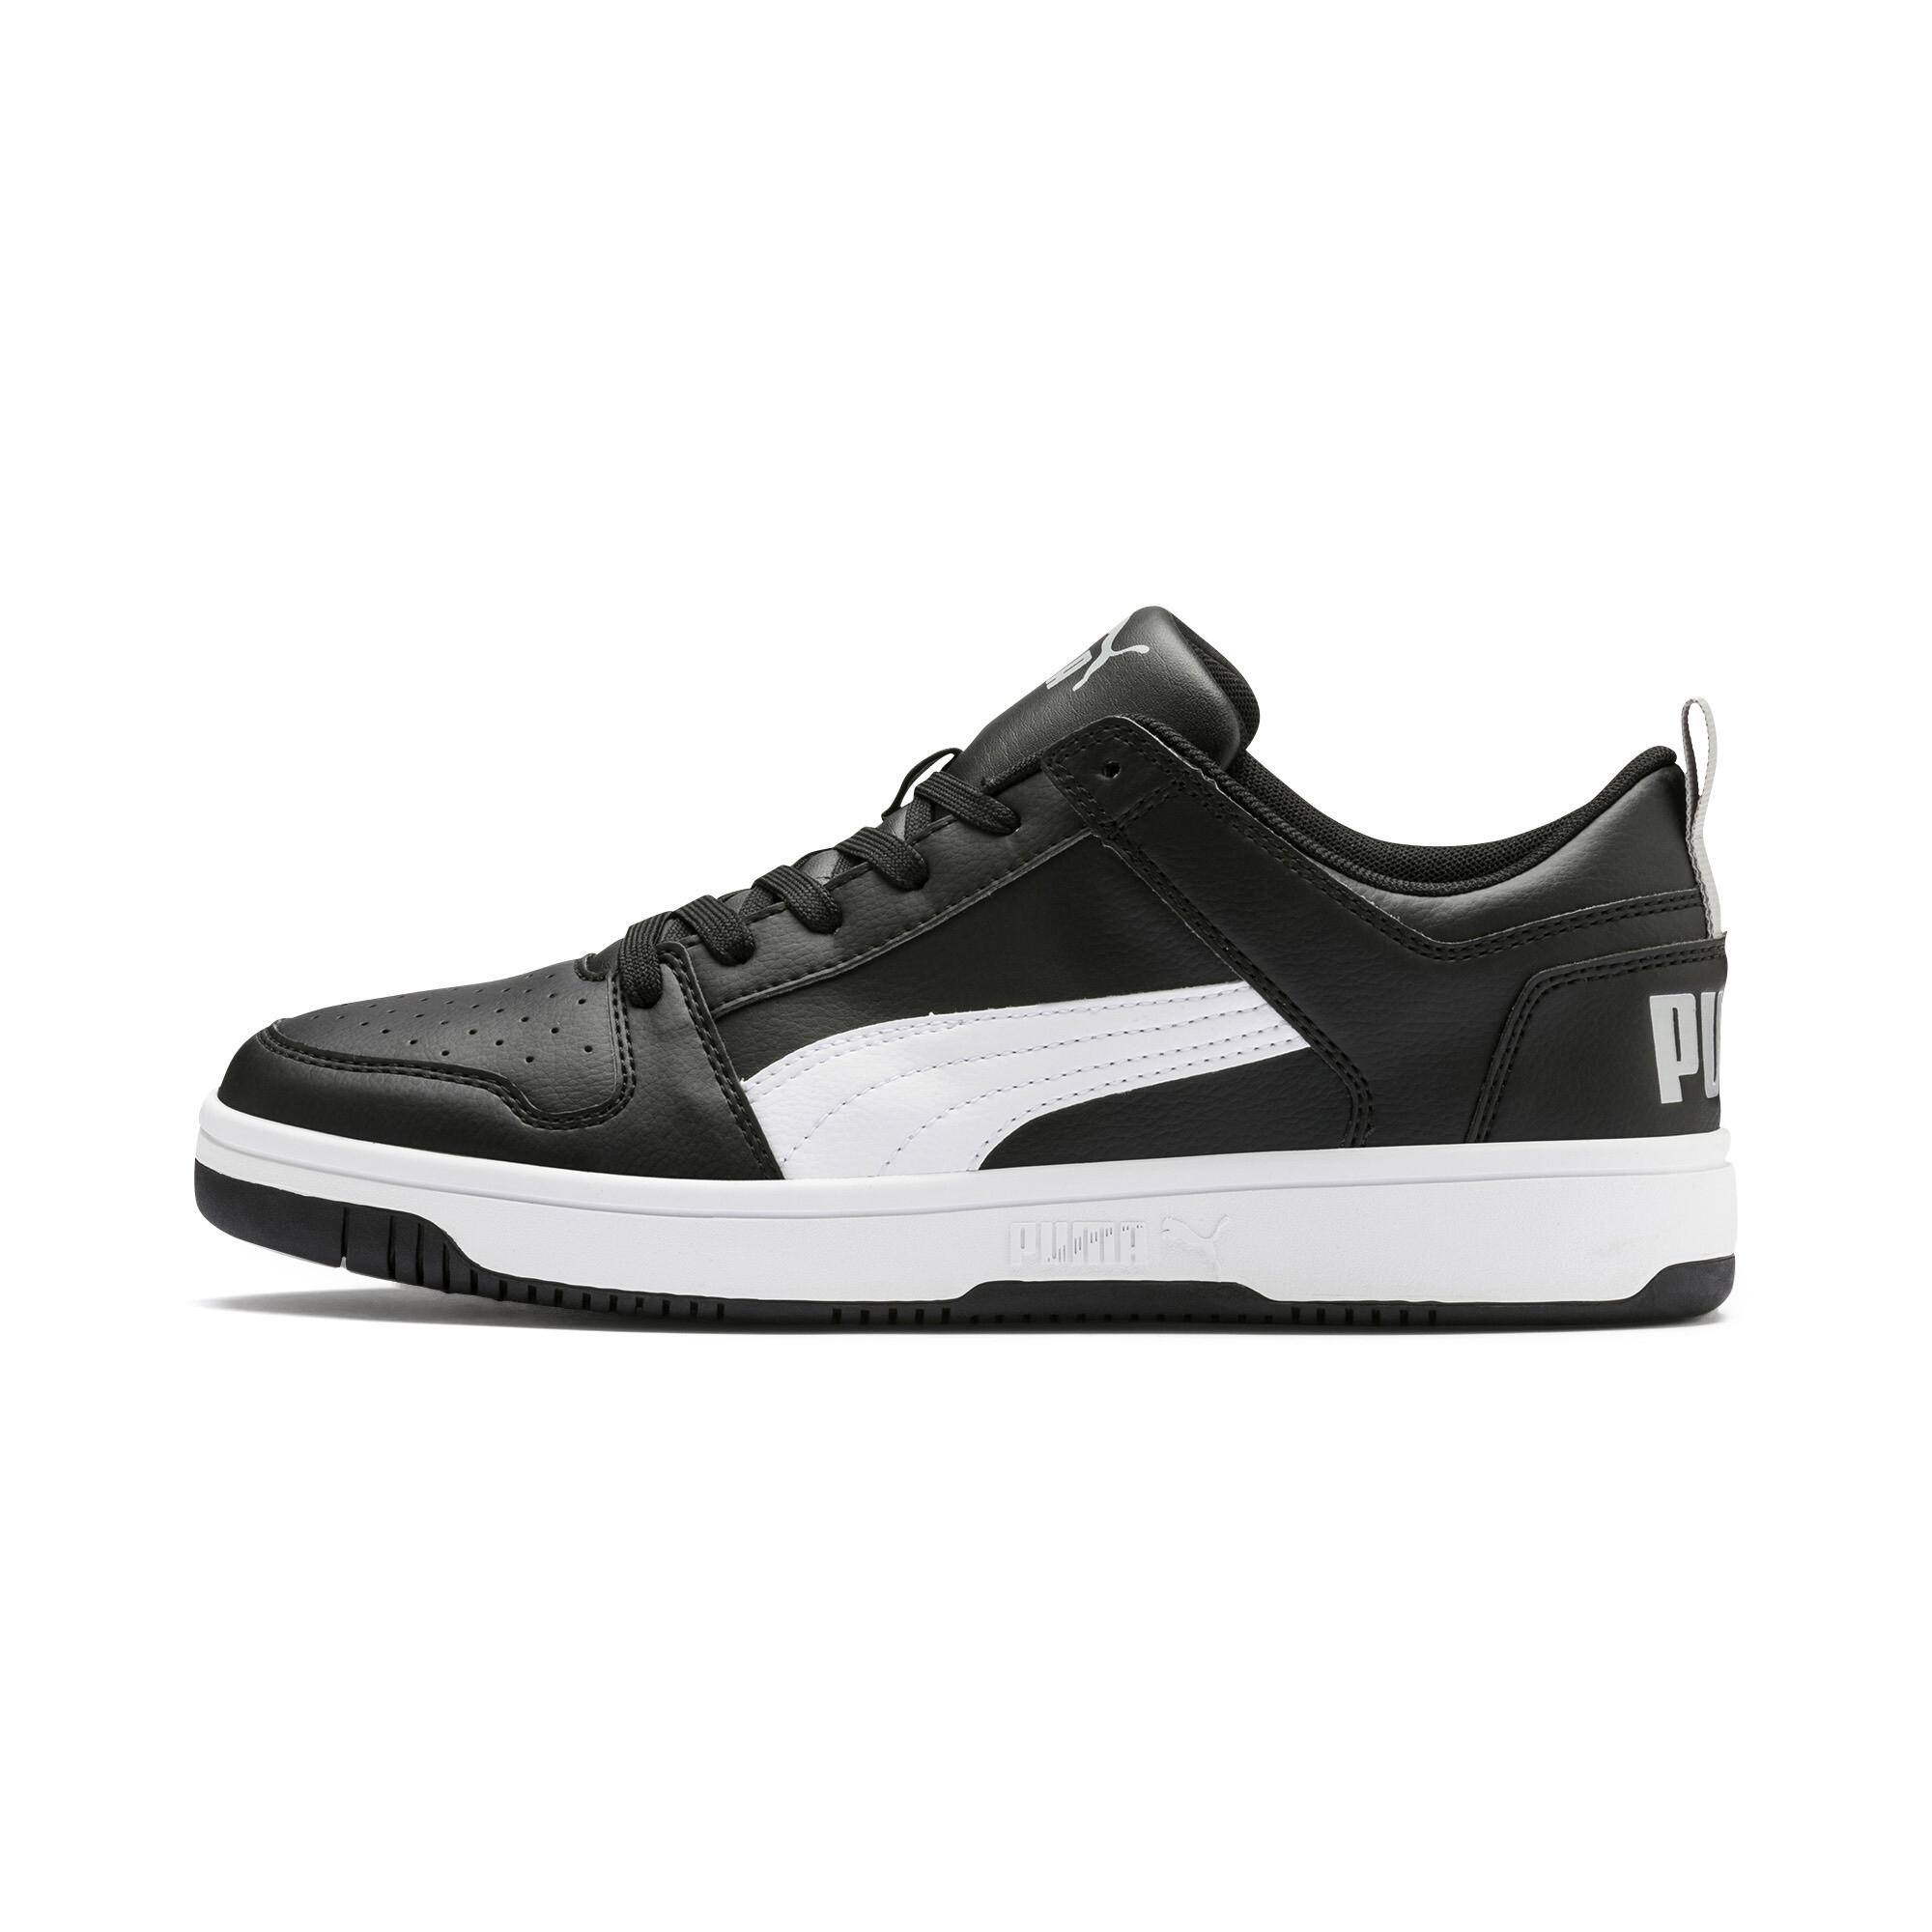 PUMA-PUMA-Rebound-LayUp-Lo-Men-039-s-Sneakers-Men-Shoe-Basics miniatura 9